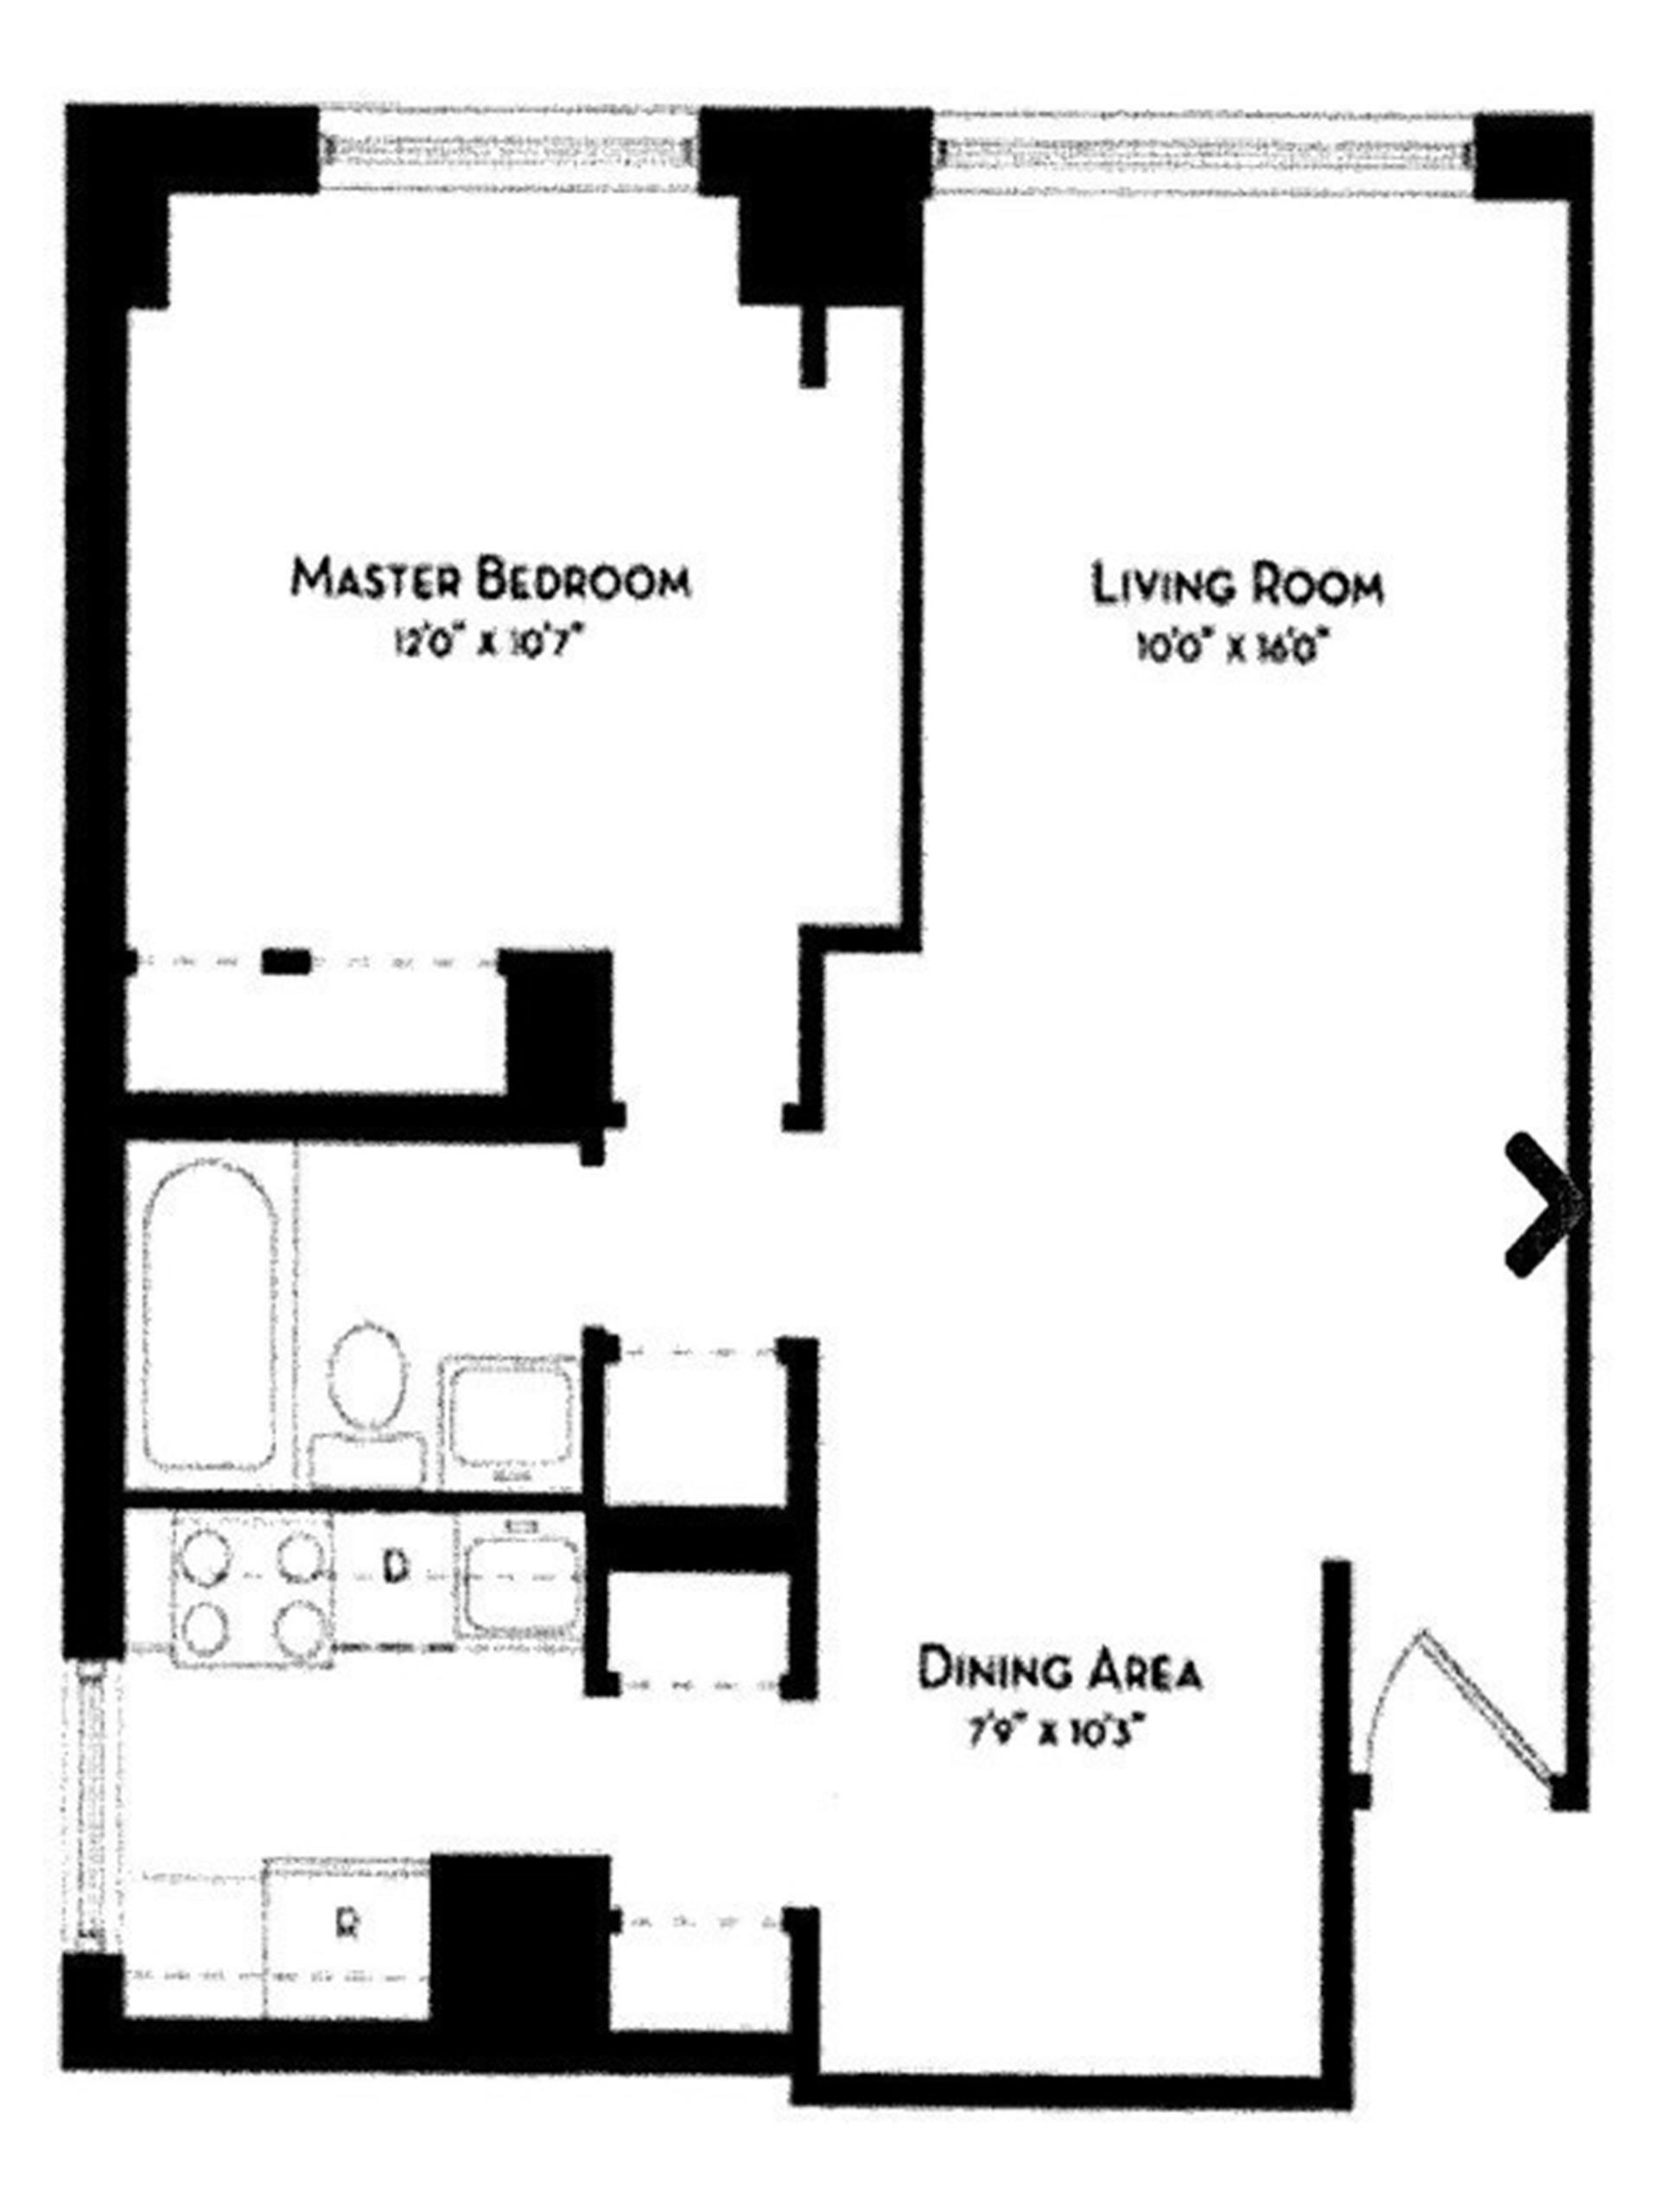 Floor plan of L'Ecole Condominium, 212 East 47th St, 16AF - Turtle Bay, New York